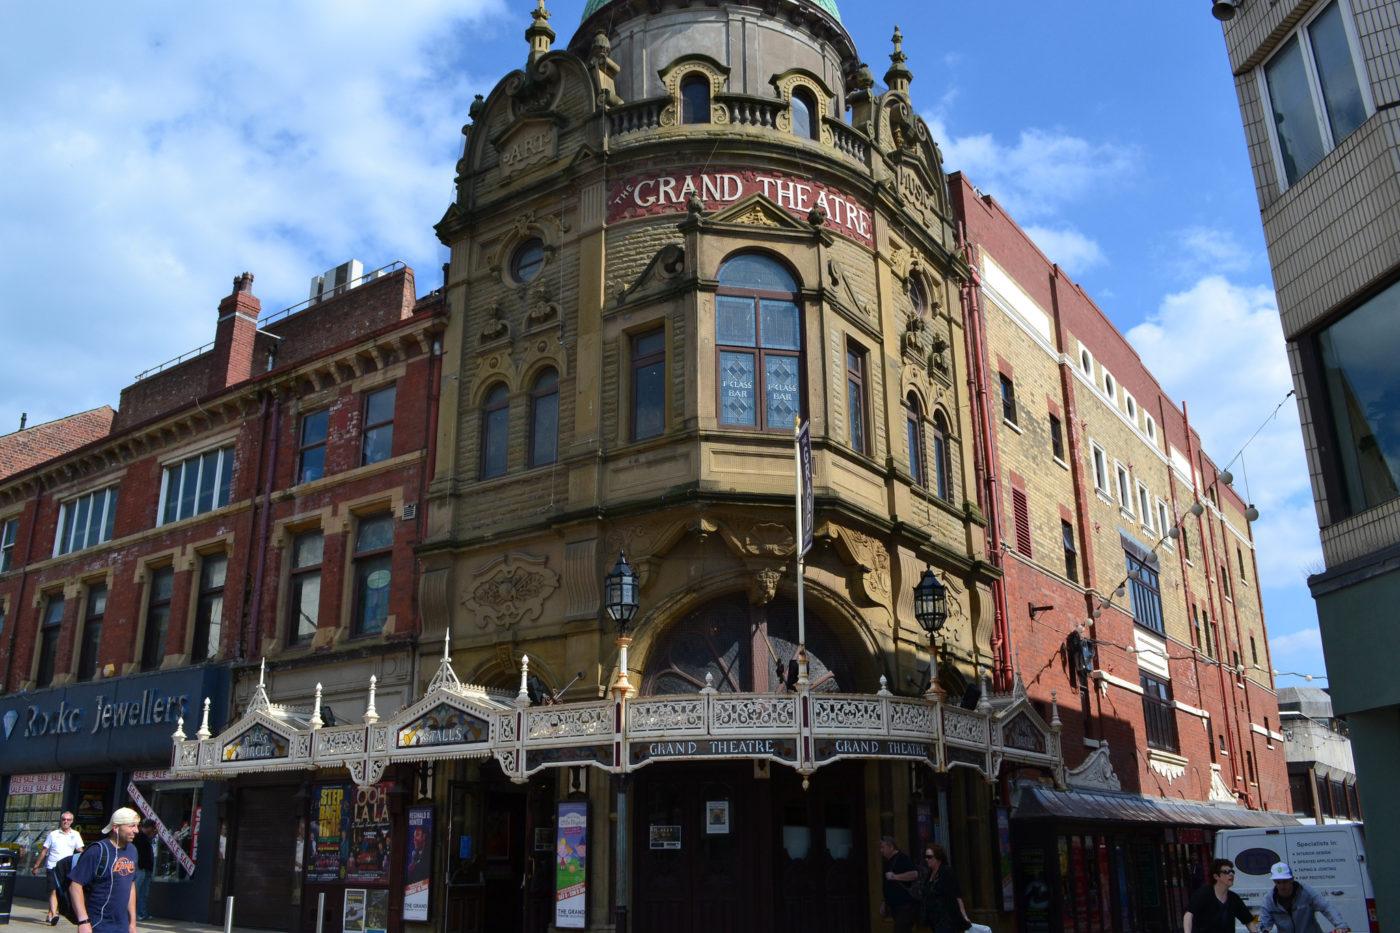 Blackpool Grand Theatre exterior